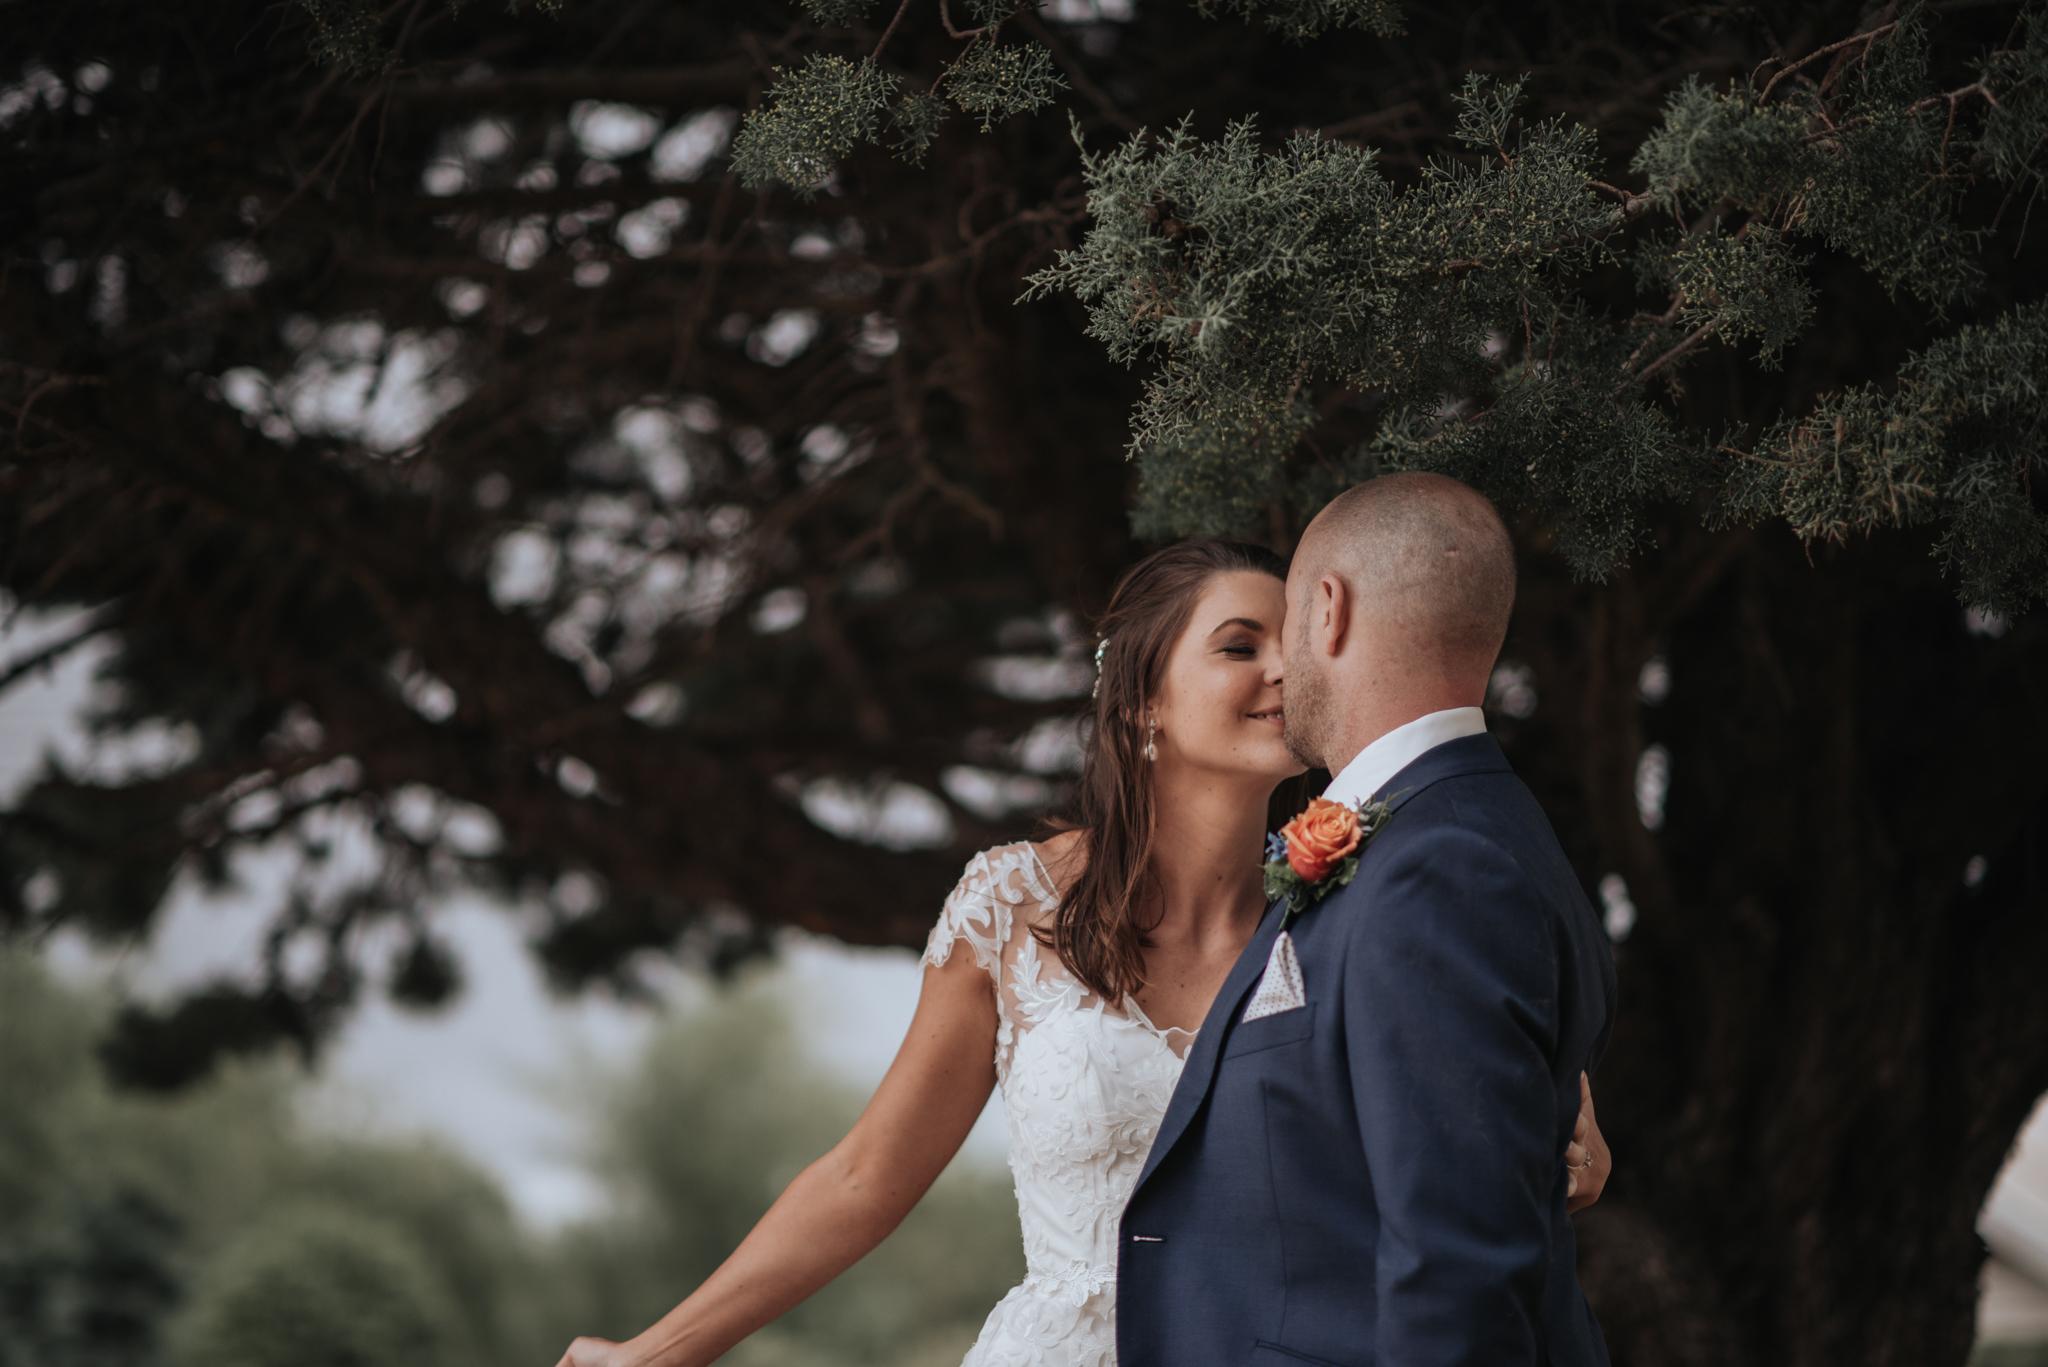 LOVELENSCAPES PHOTOGRAPHY • VISUAL POETRY • NEW ZEALAND WEDDING PHOTOGRAPHER • AUSTRALIAN WEDDING PHOTOGRAPHER • BRISBANE • MELBOURNE • SYDNEY • HOBART • TARUREKA ESTATE • ANNA CAMPBELL • 147.jpg